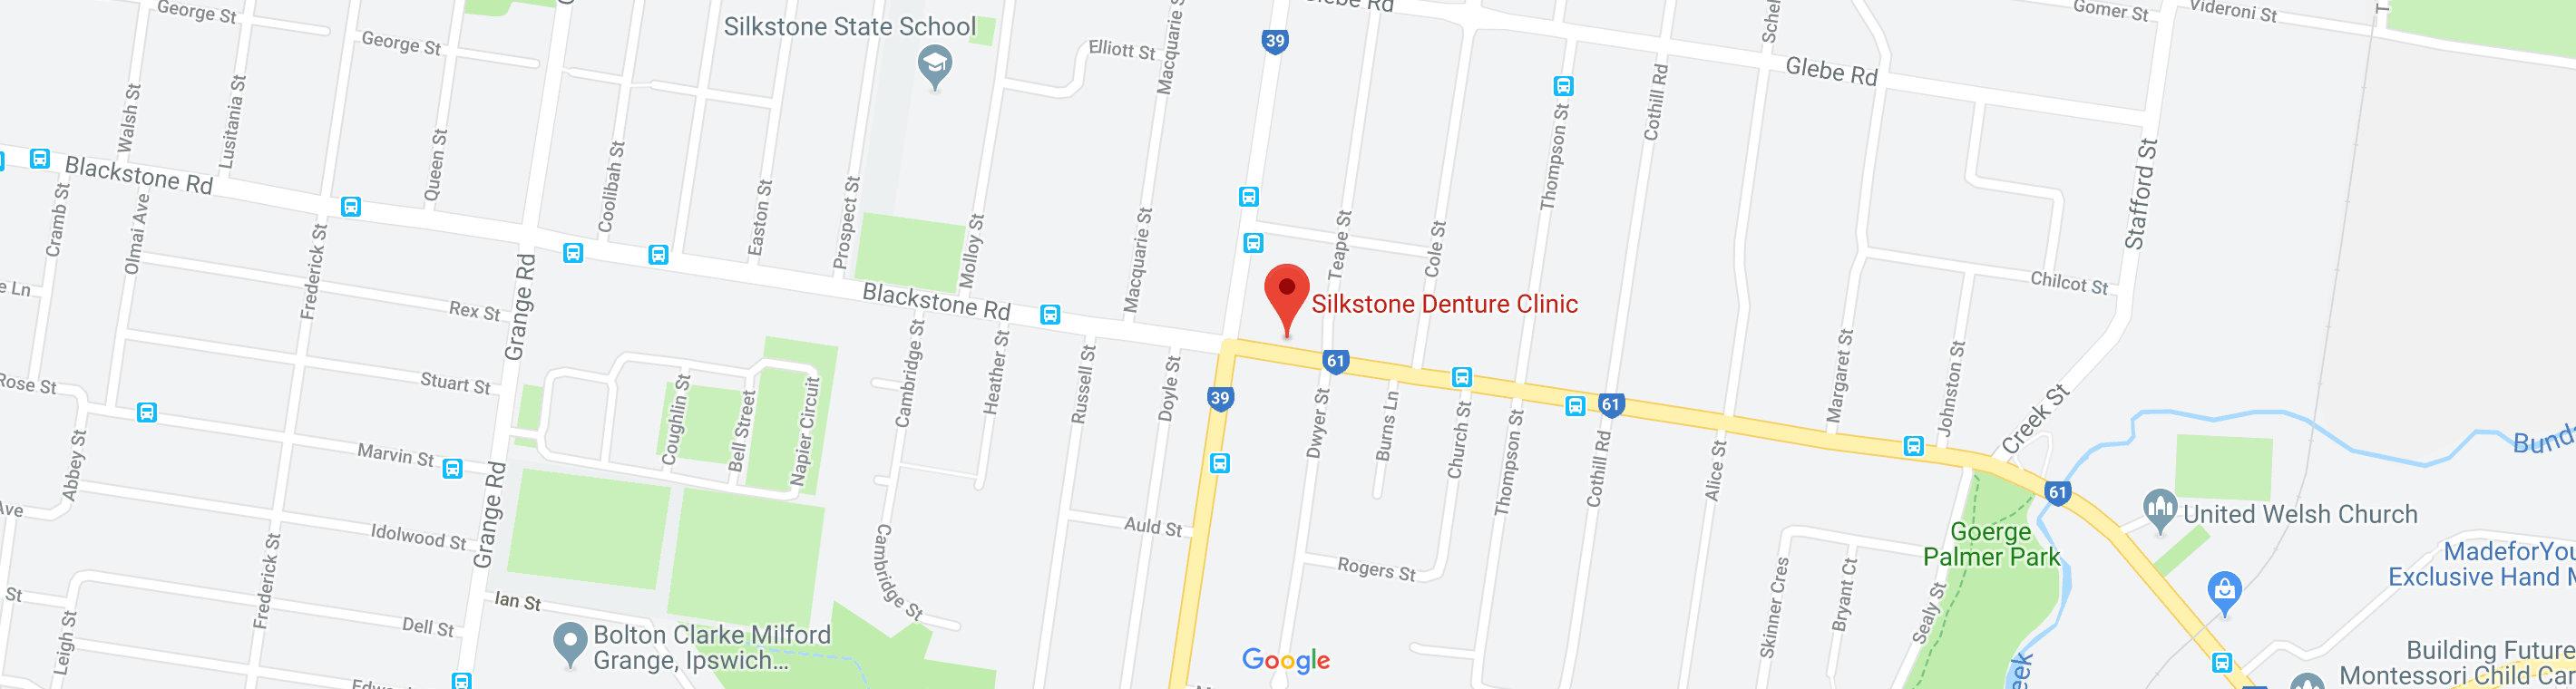 View Silkstone Denture Clinic location